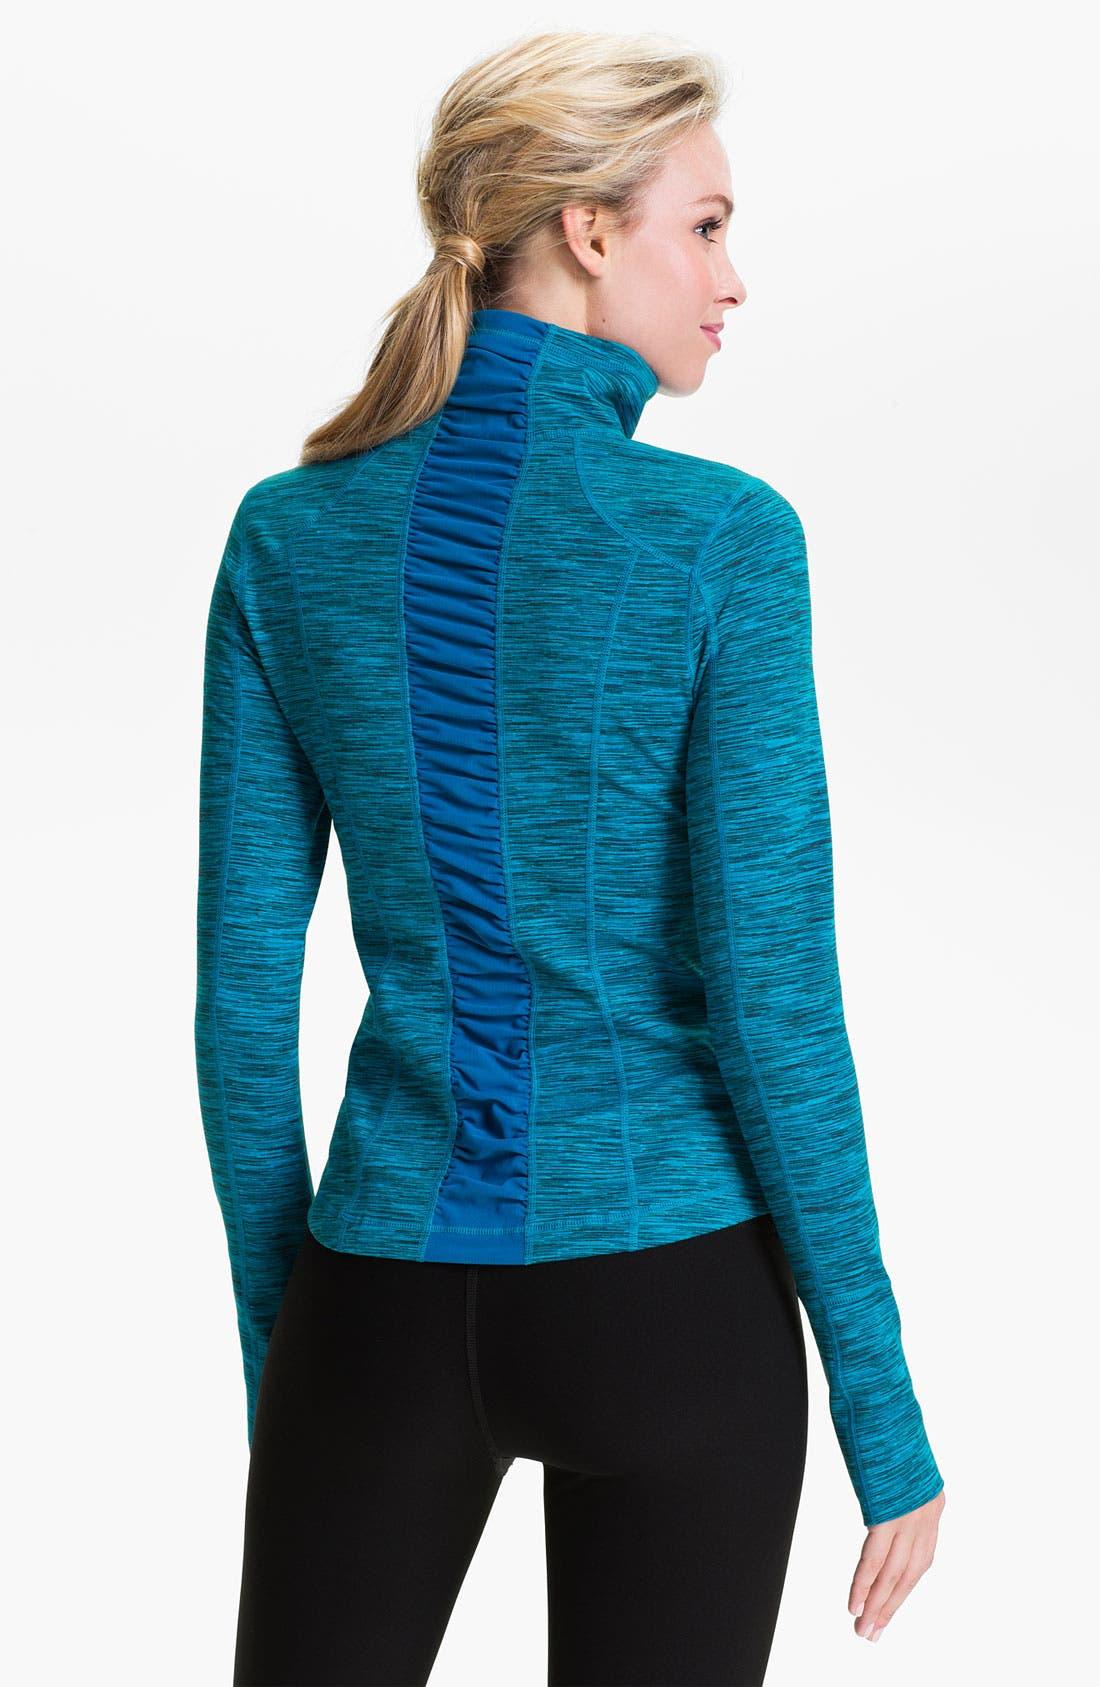 Alternate Image 1 Selected - Zella 'Sophia' Space Dye Jacket